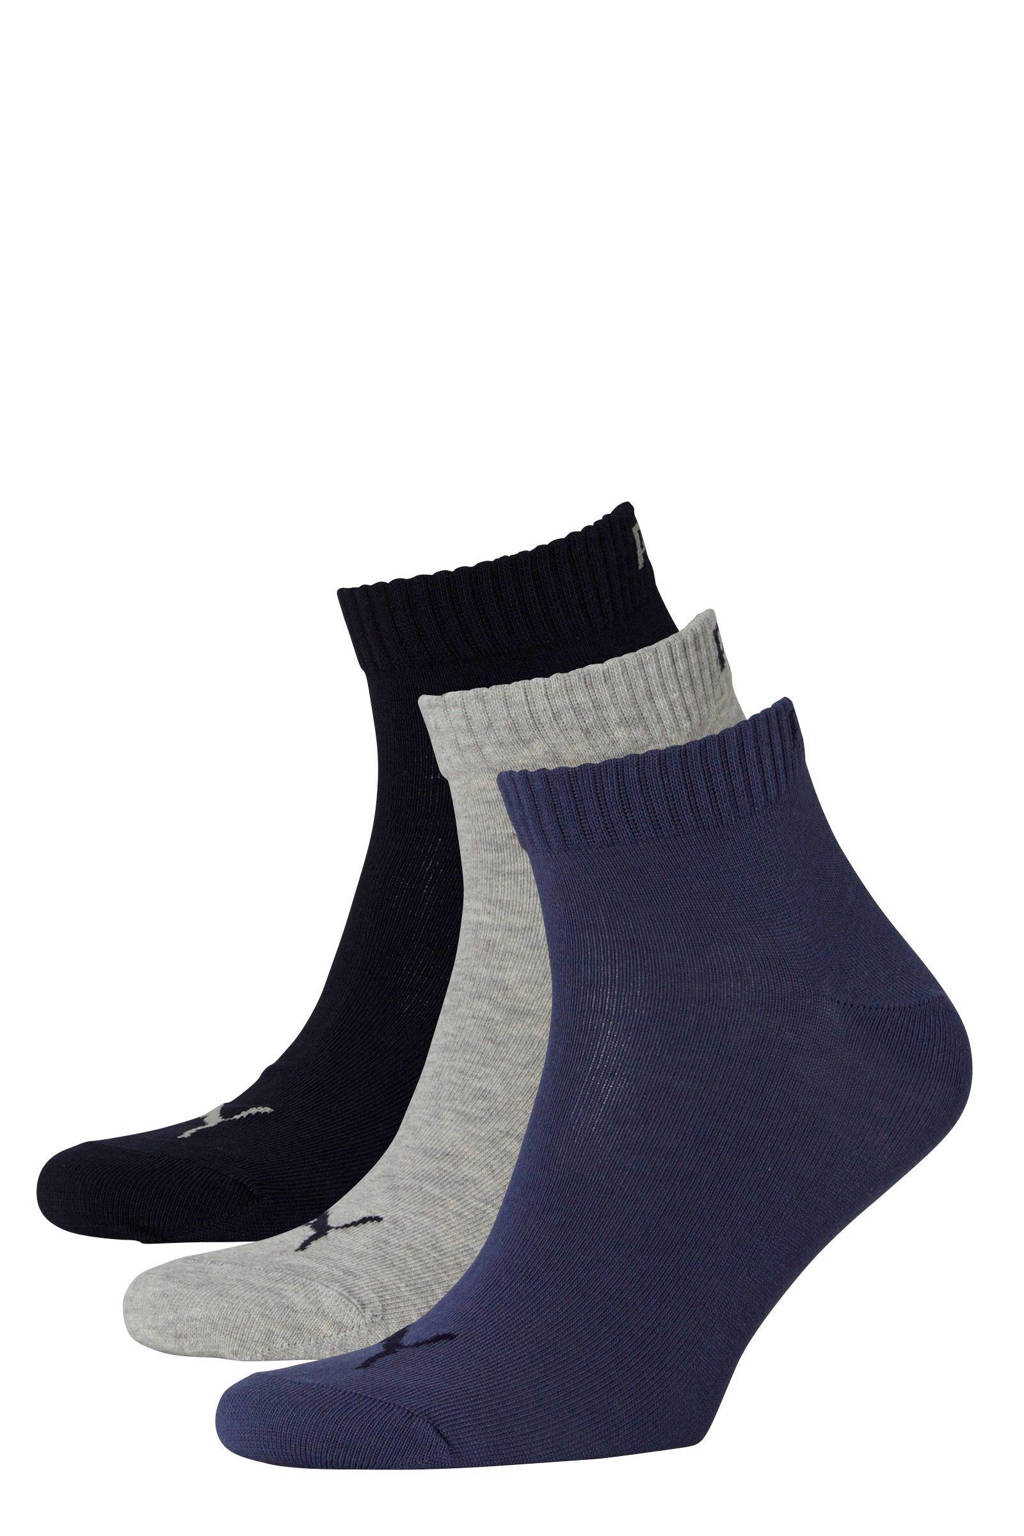 Puma sportsokken - set van 3 multi, marine/grijs/blauw